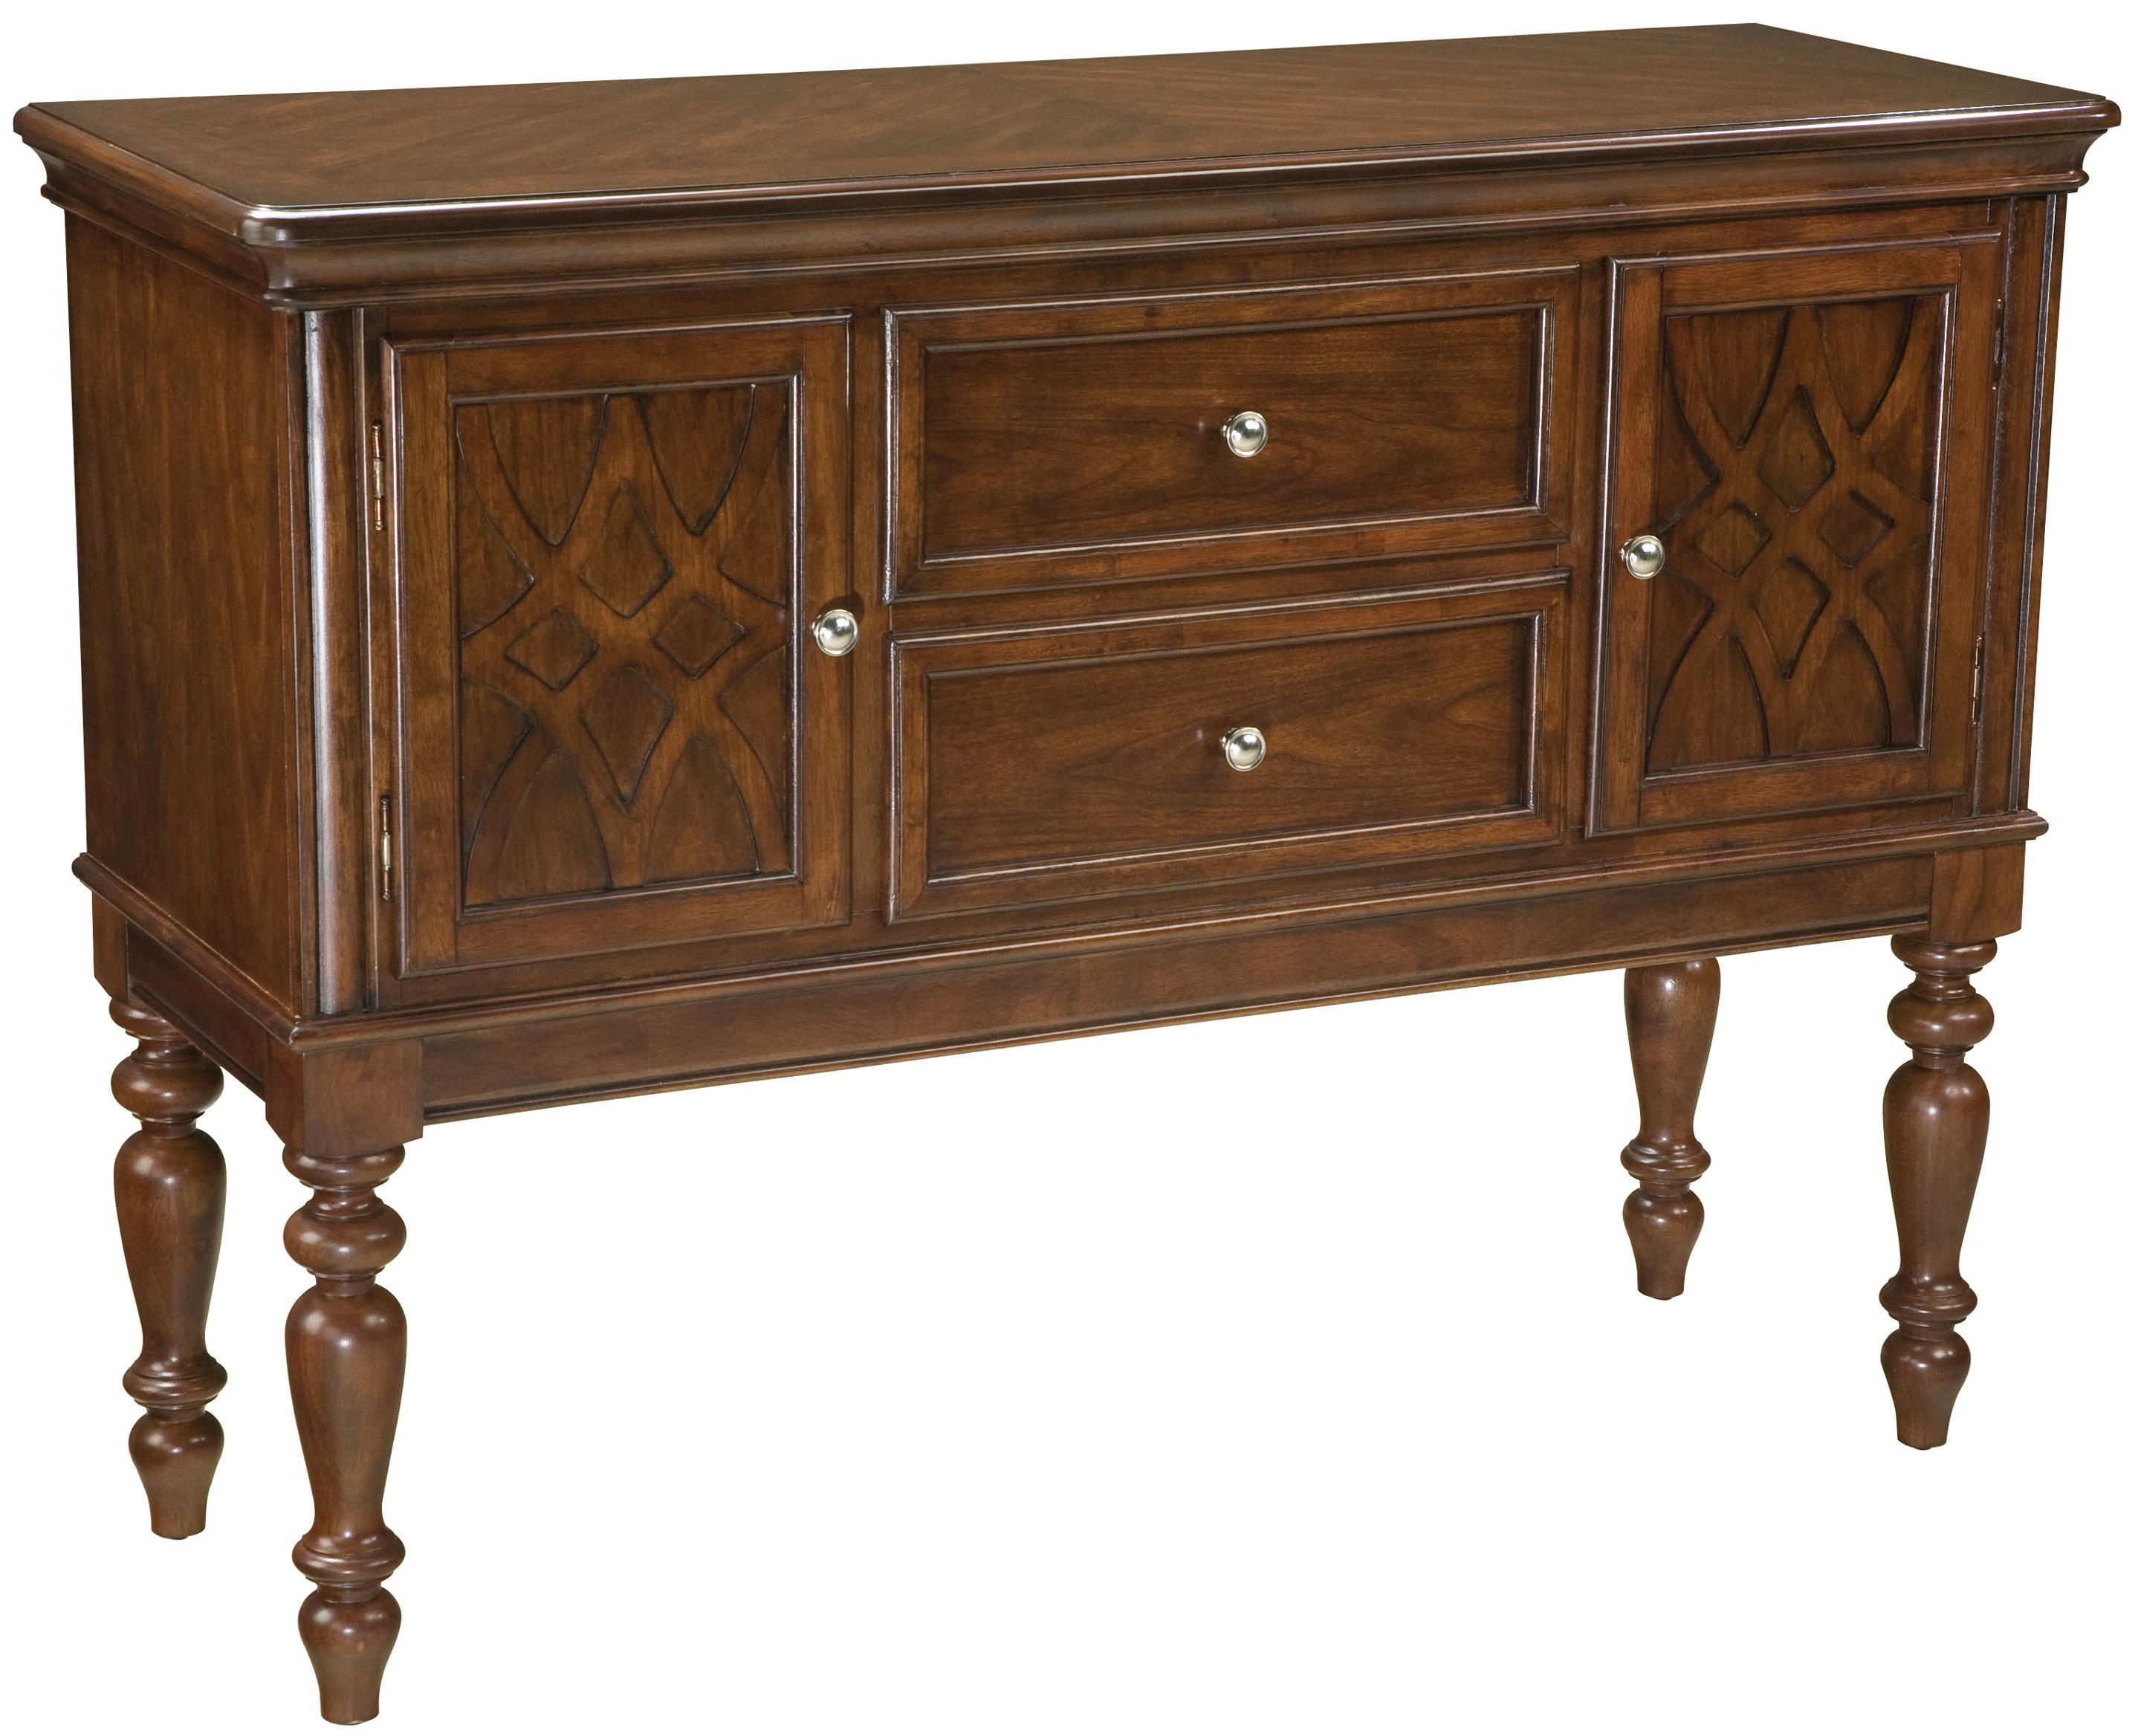 Standard Furniture Woodmont 2 Door Sideboard with 2 Drawers ...